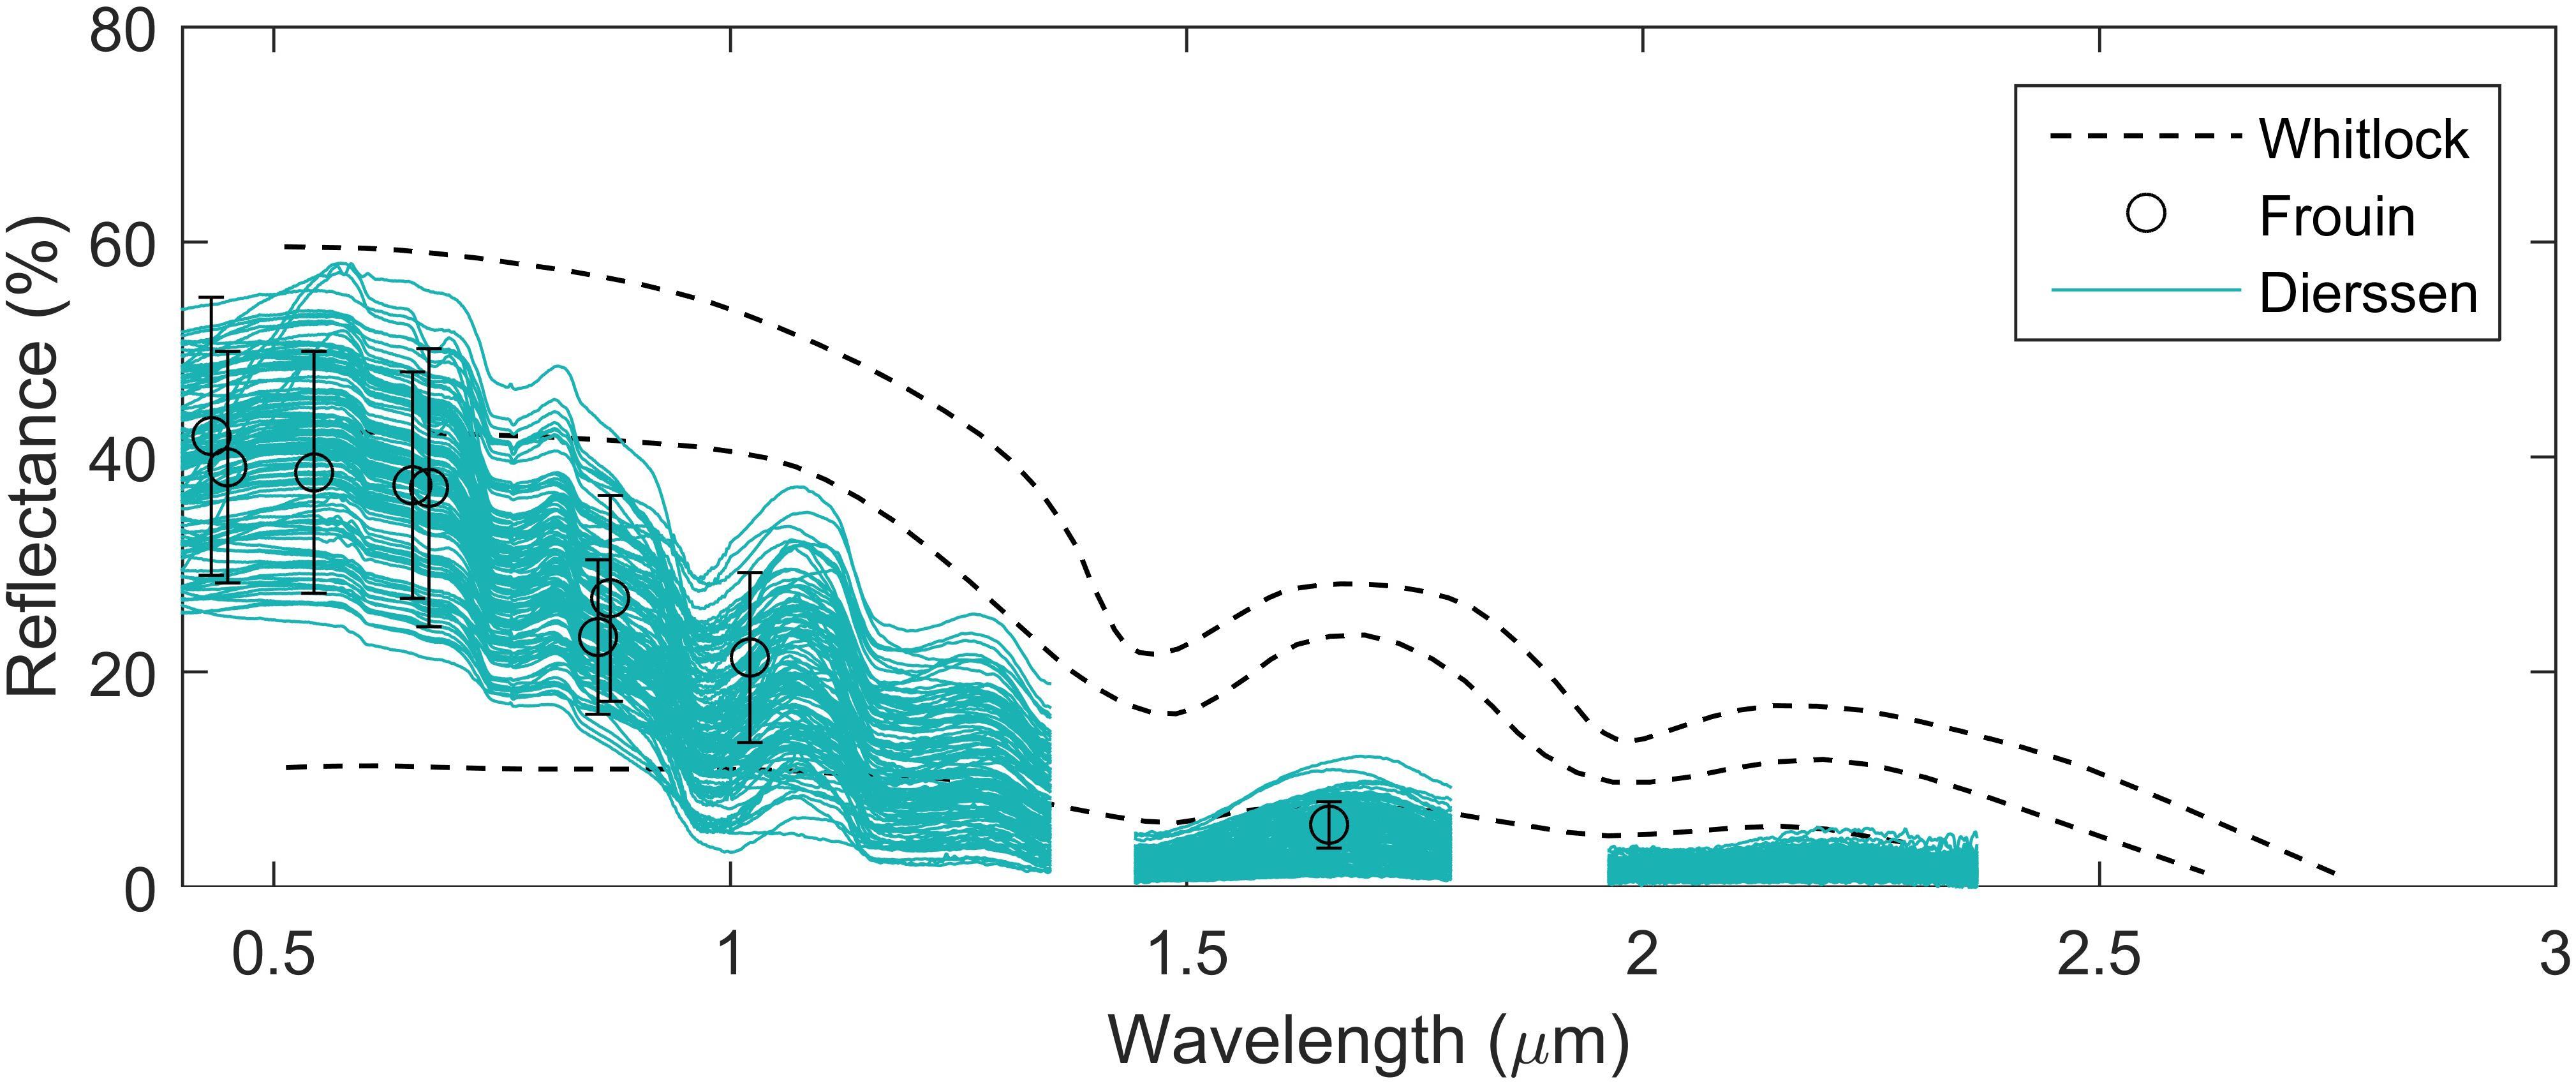 Frontiers | Modeling Atmosphere-Ocean Radiative Transfer: A